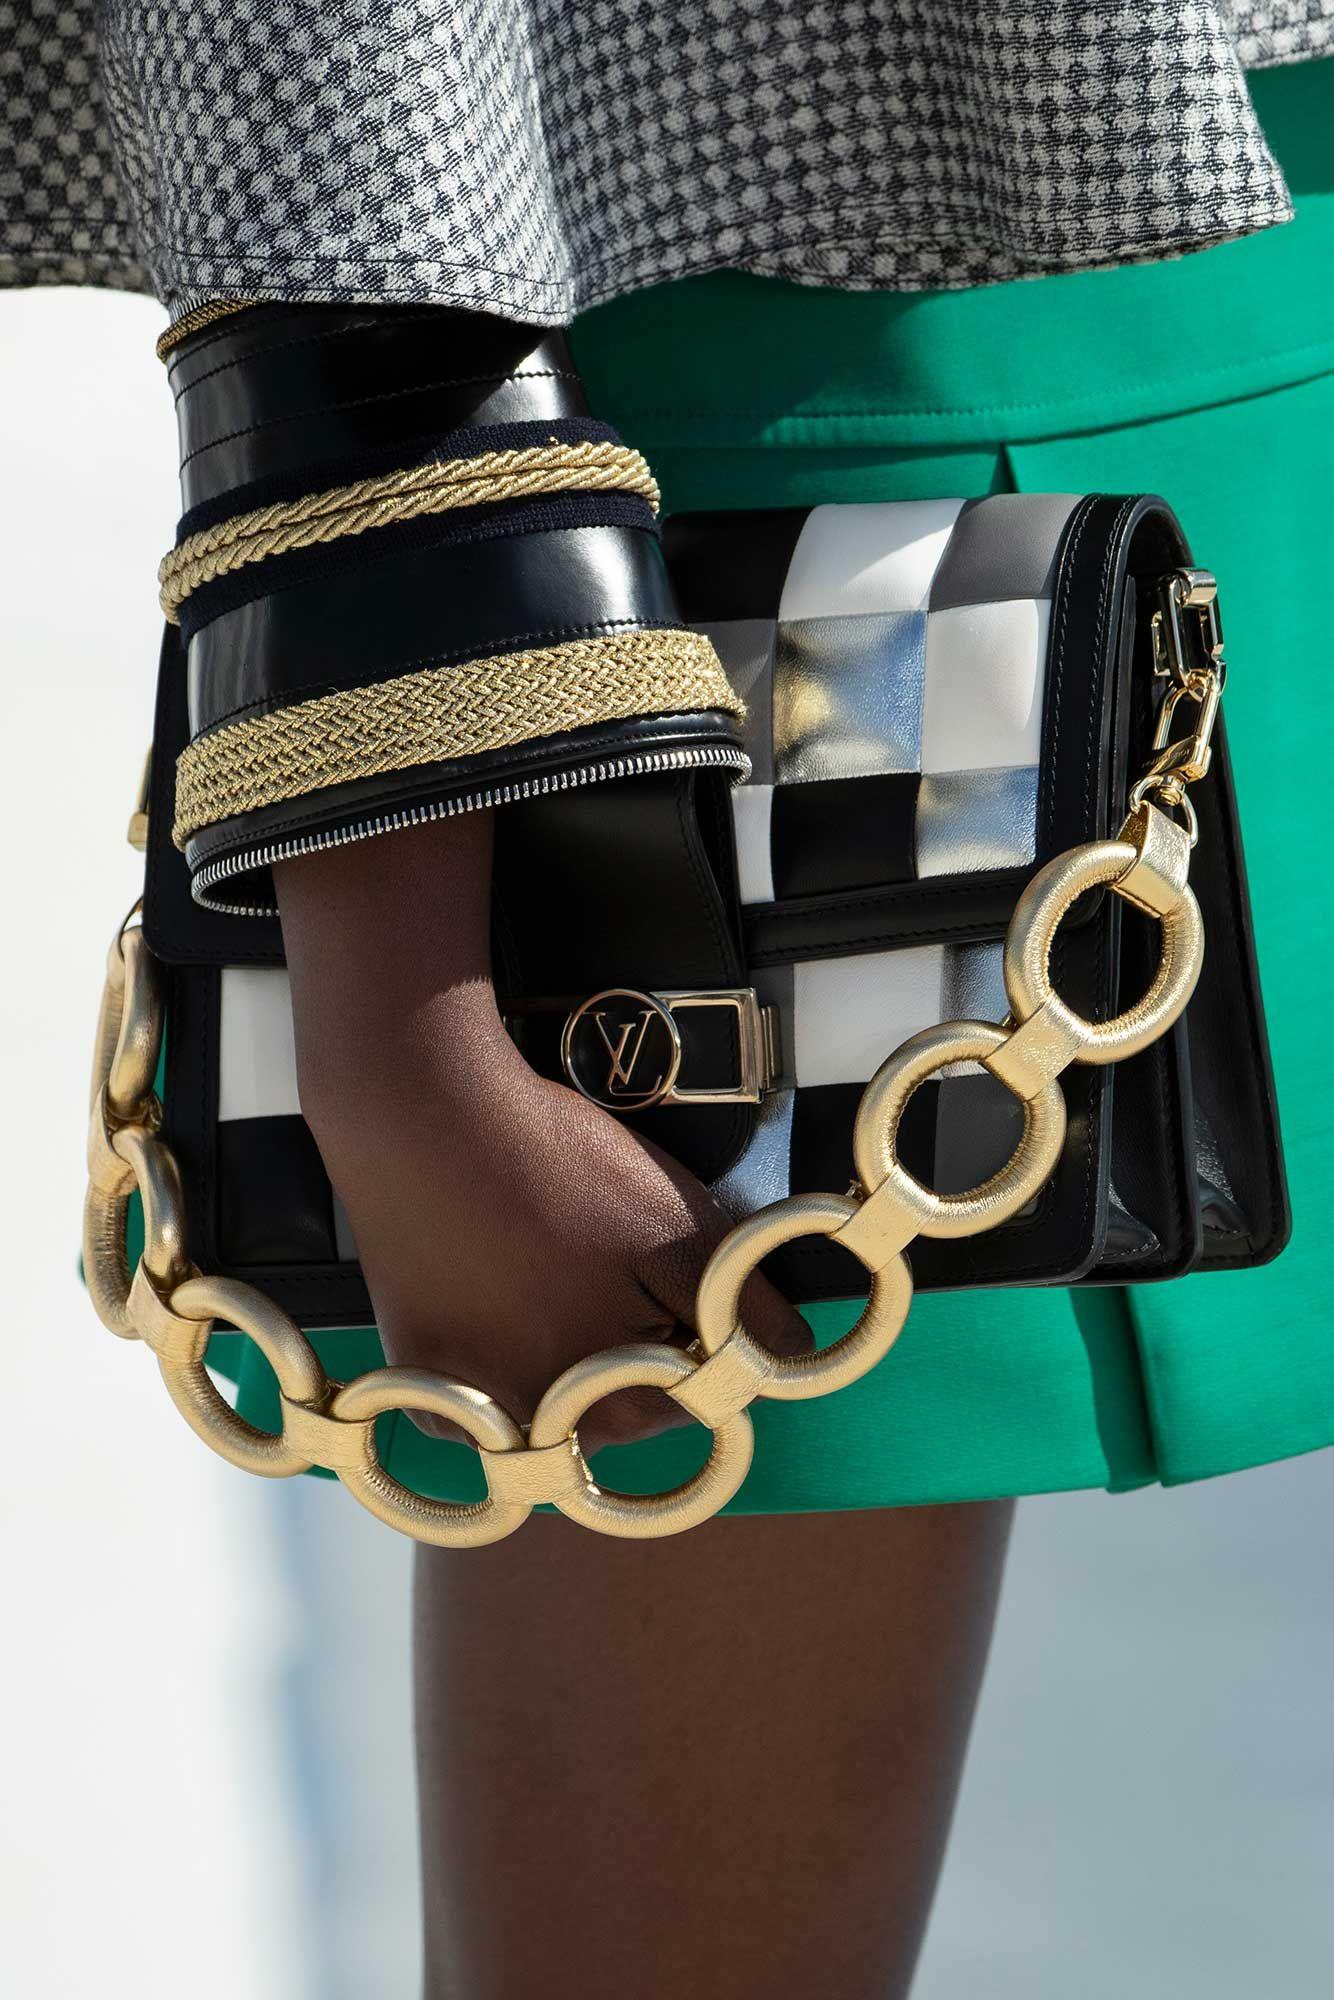 Louis Vuitton Cruise 2022: 15 Fabulous Accessories We Love